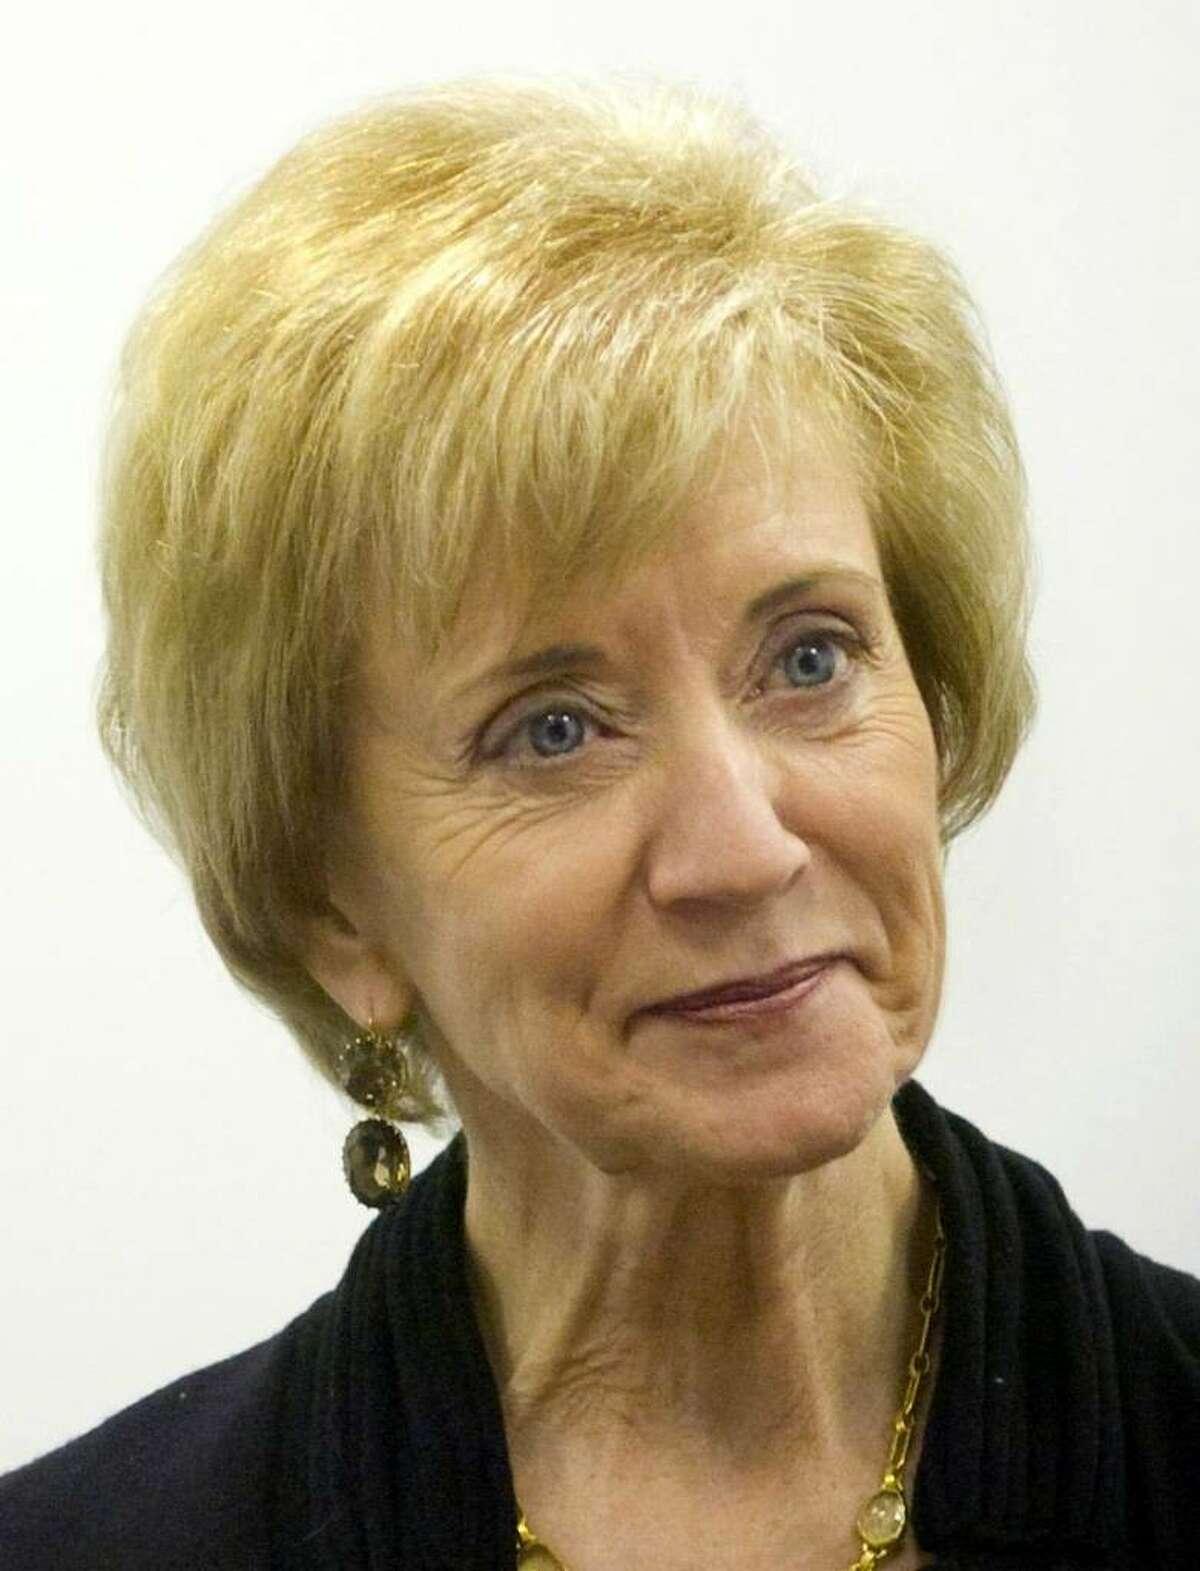 Linda McMahon, Republican candidate for the U.S. Senate